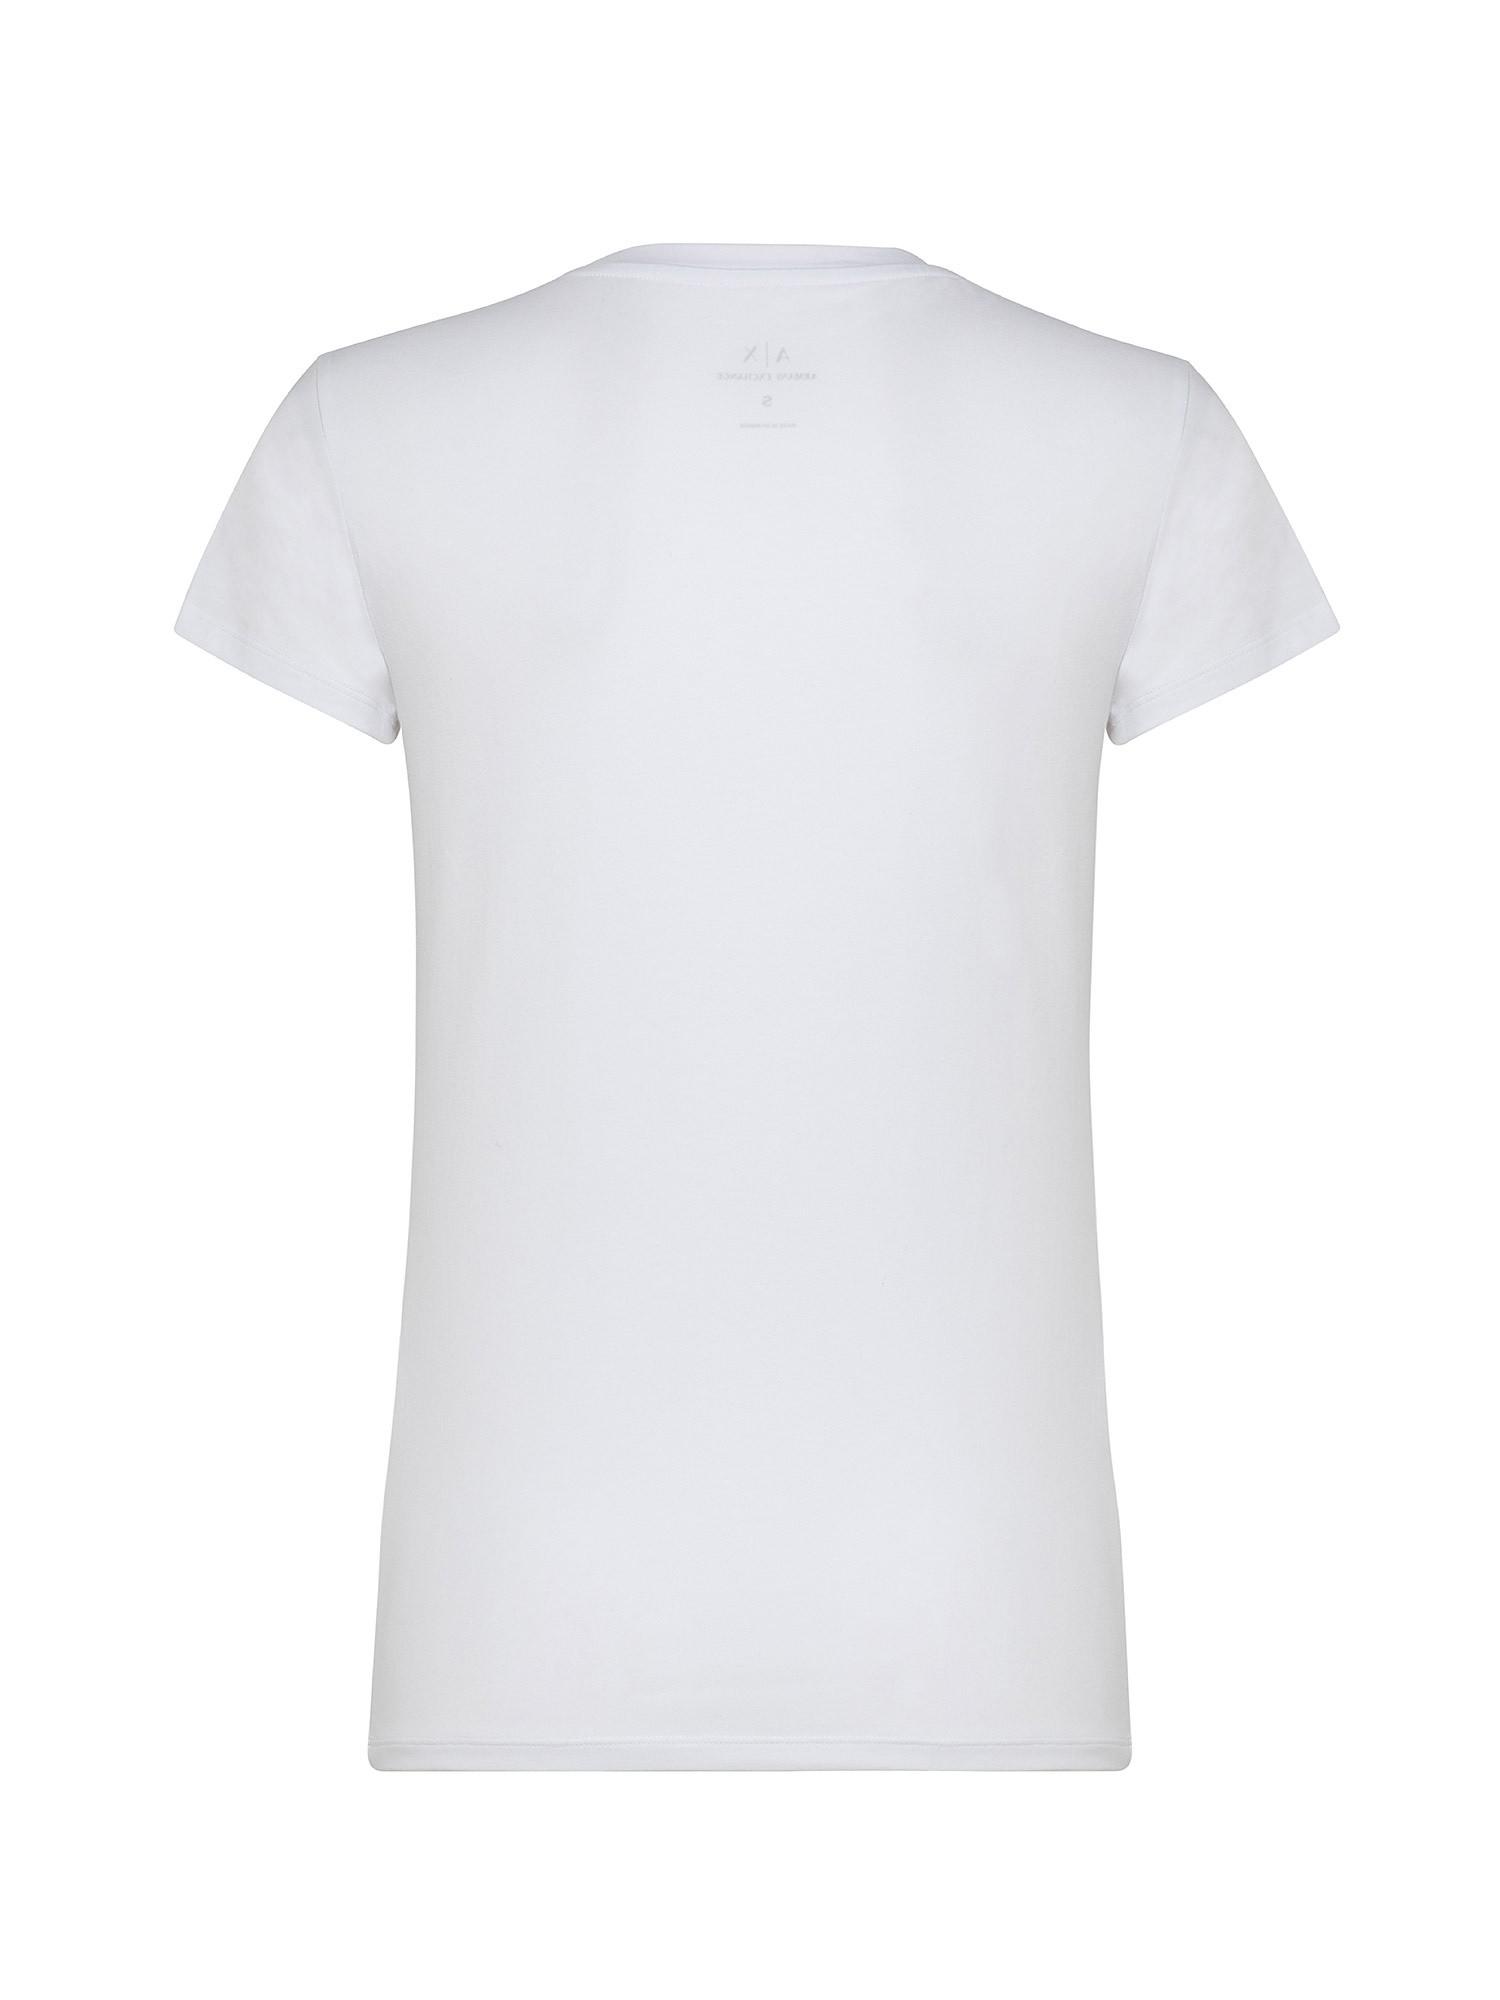 T-shirt slim fit, Bianco, large image number 1